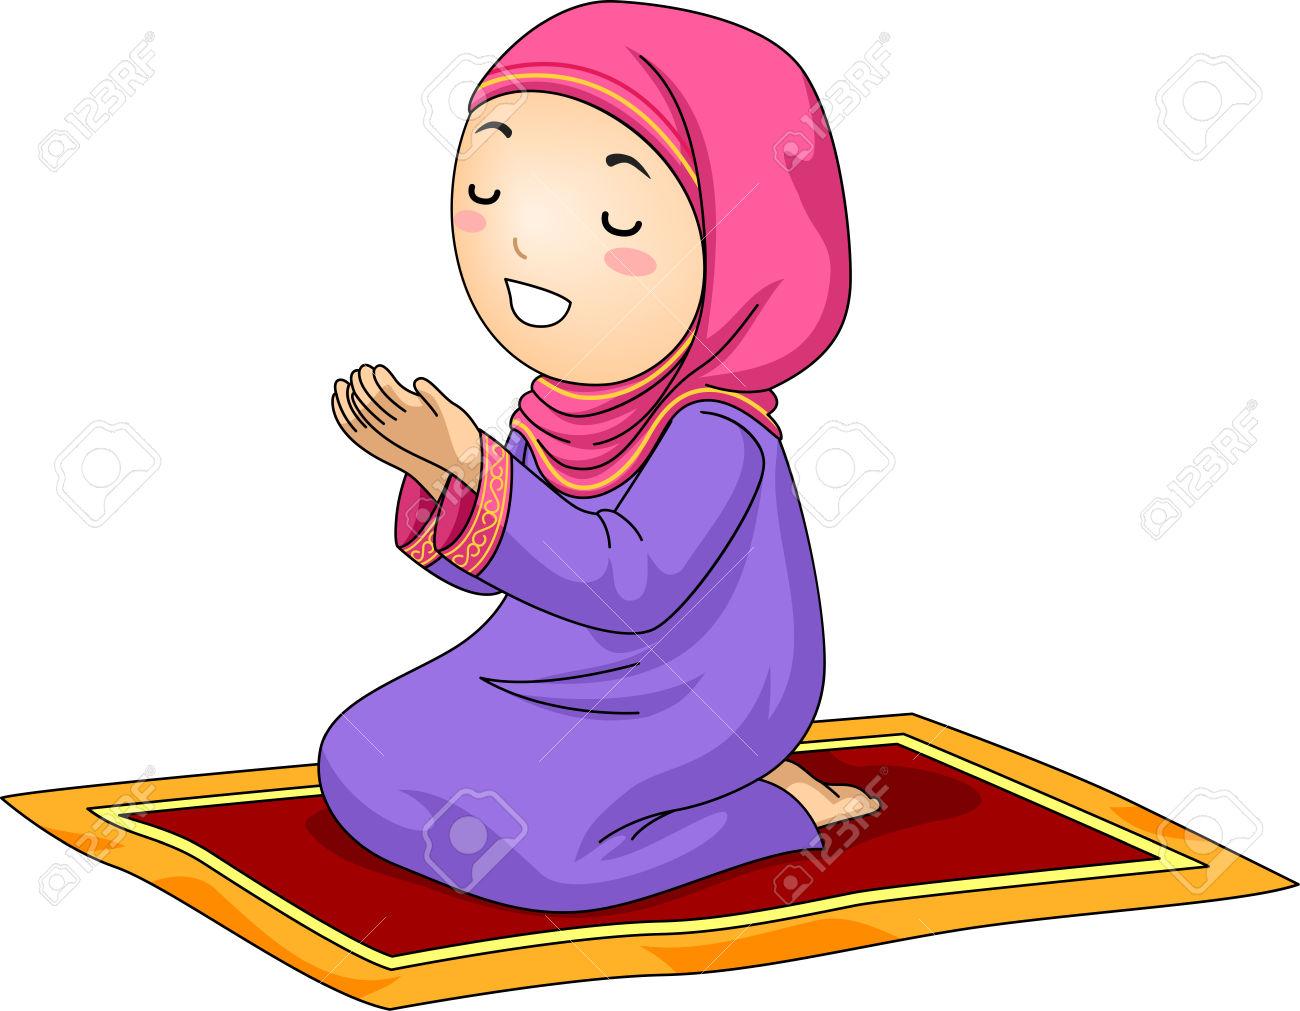 Muslim Girl Praying Clipart.